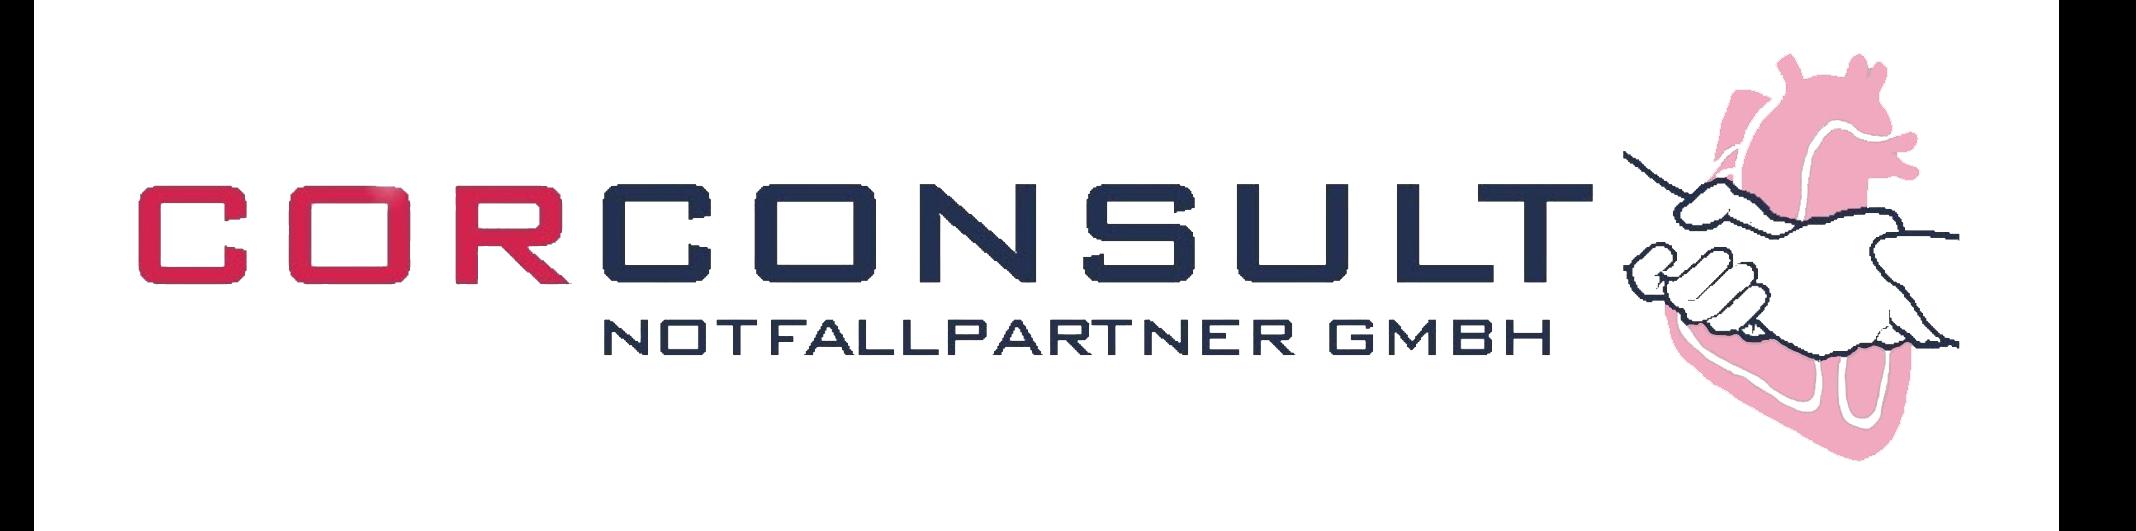 corconsult notfallpartner GmbH